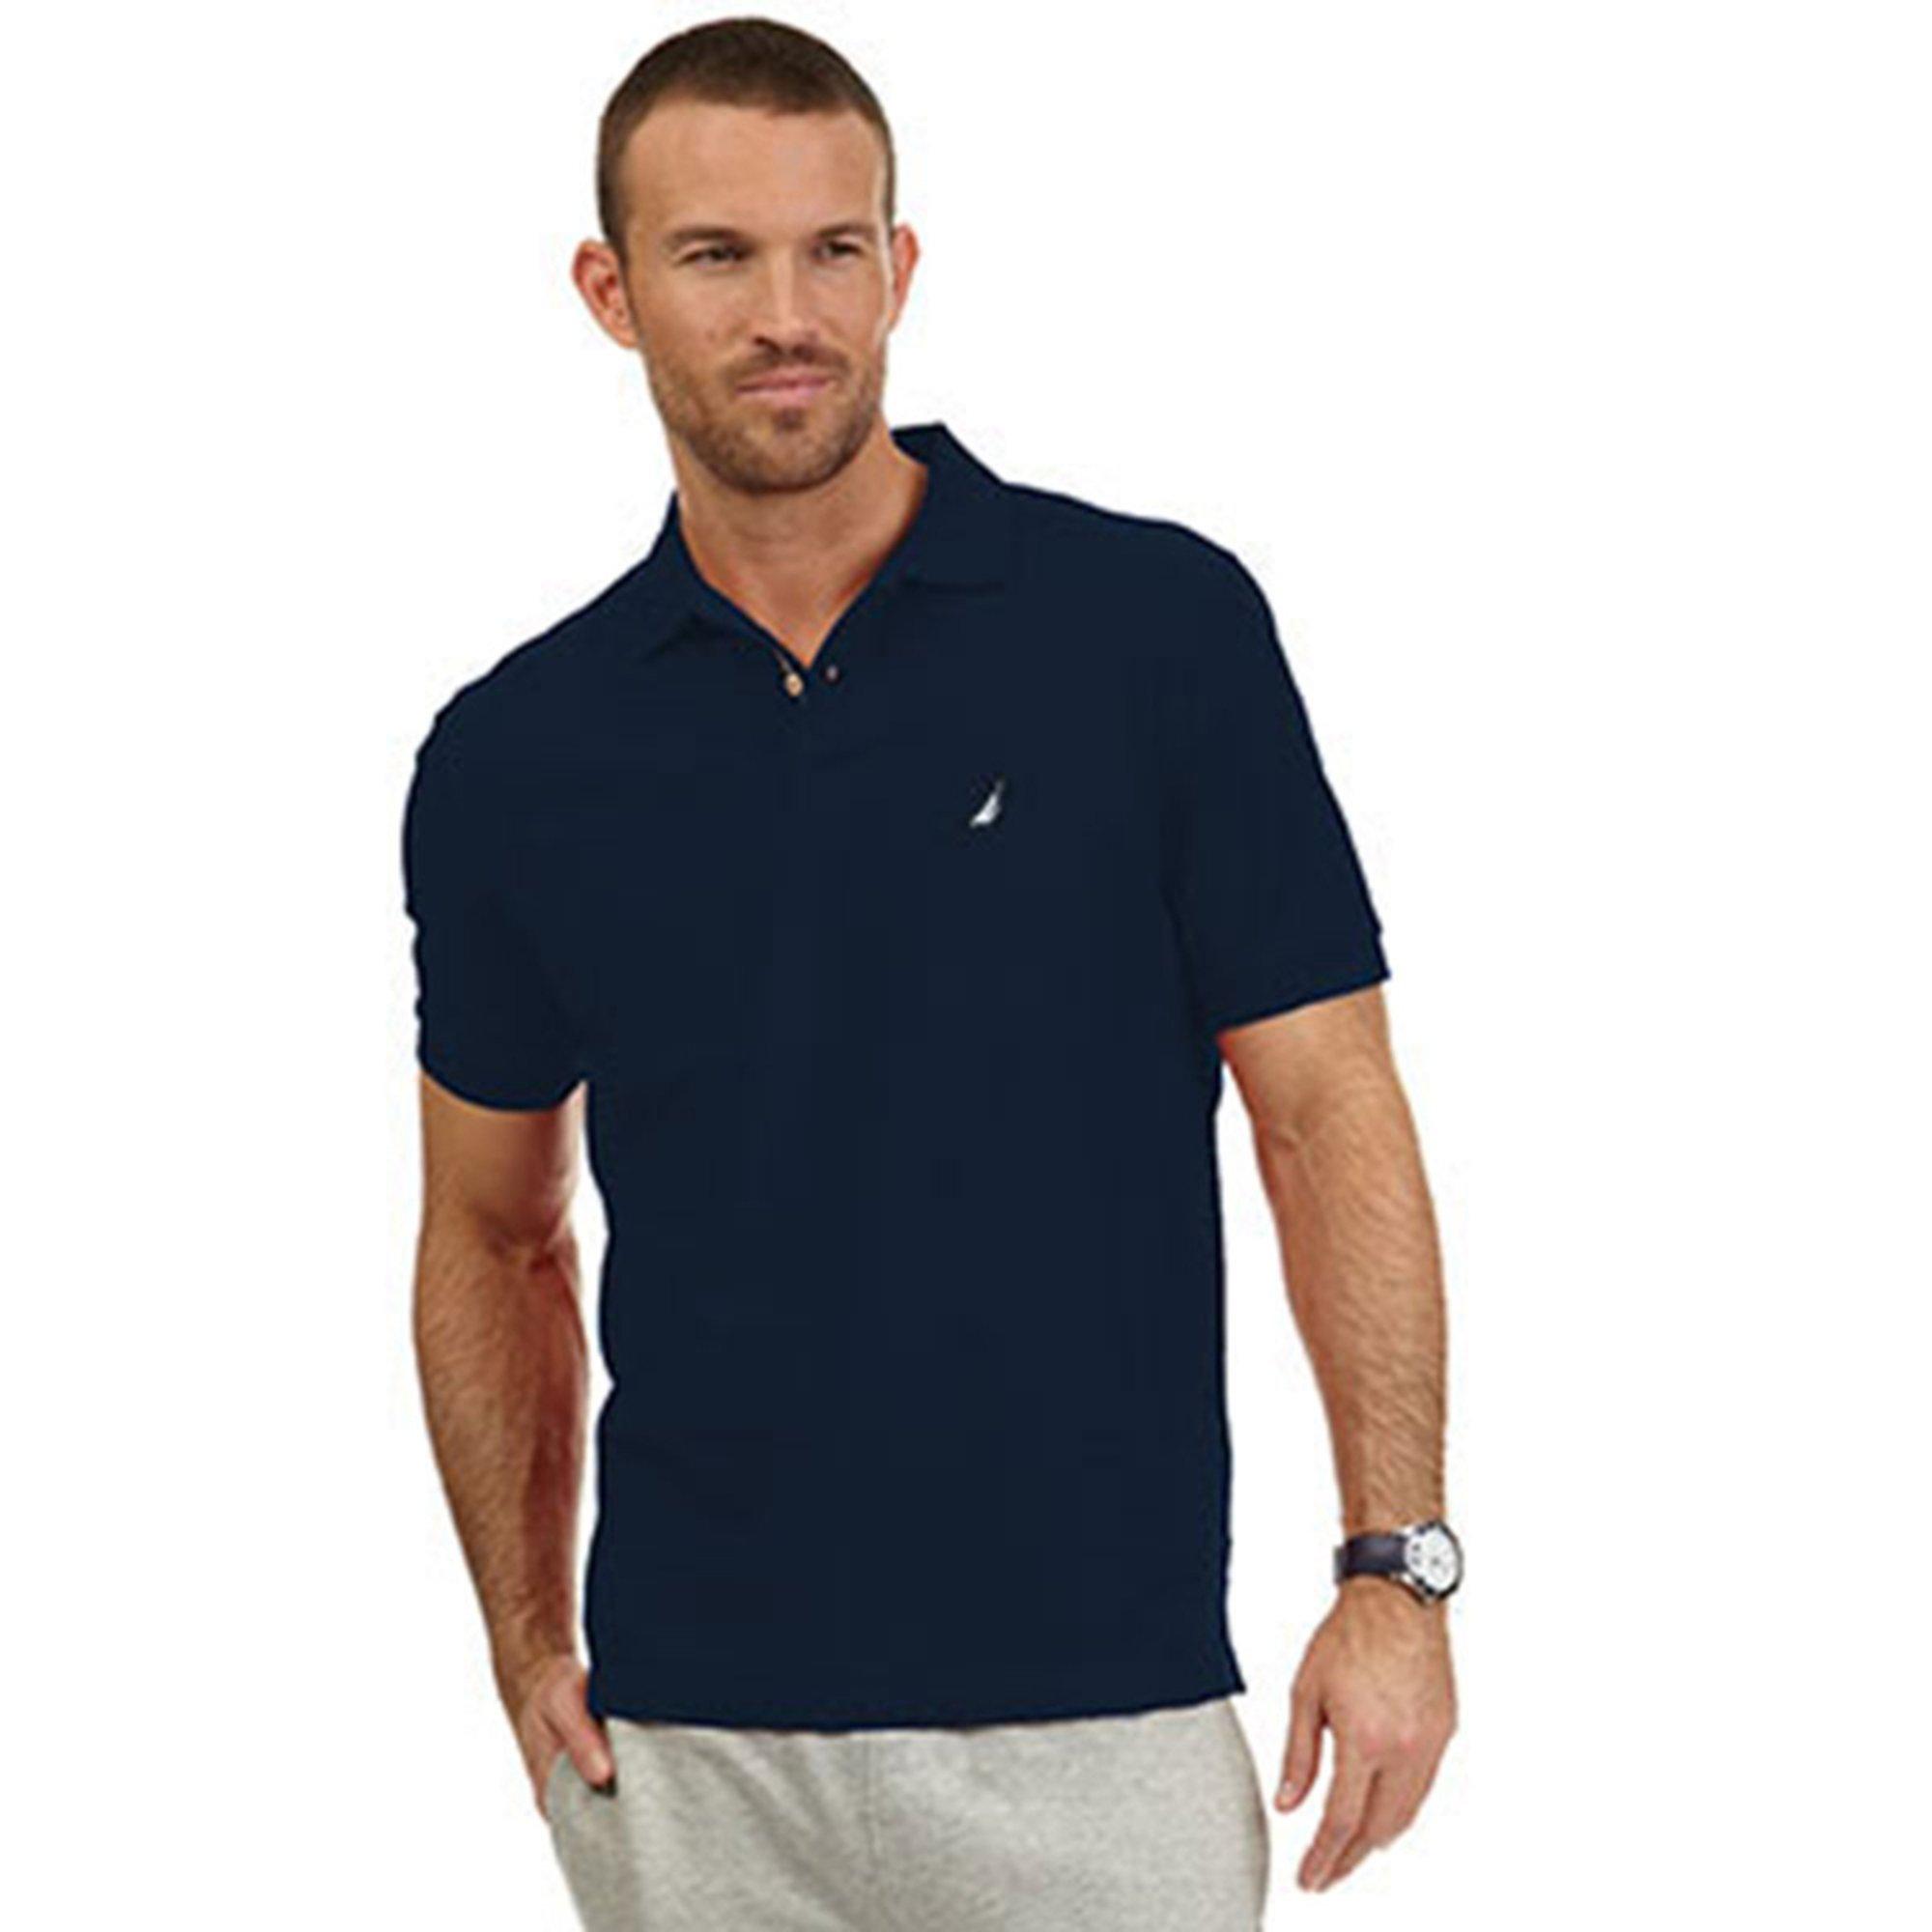 Nautica polo shirts clearance for Big and tall polo shirts on sale